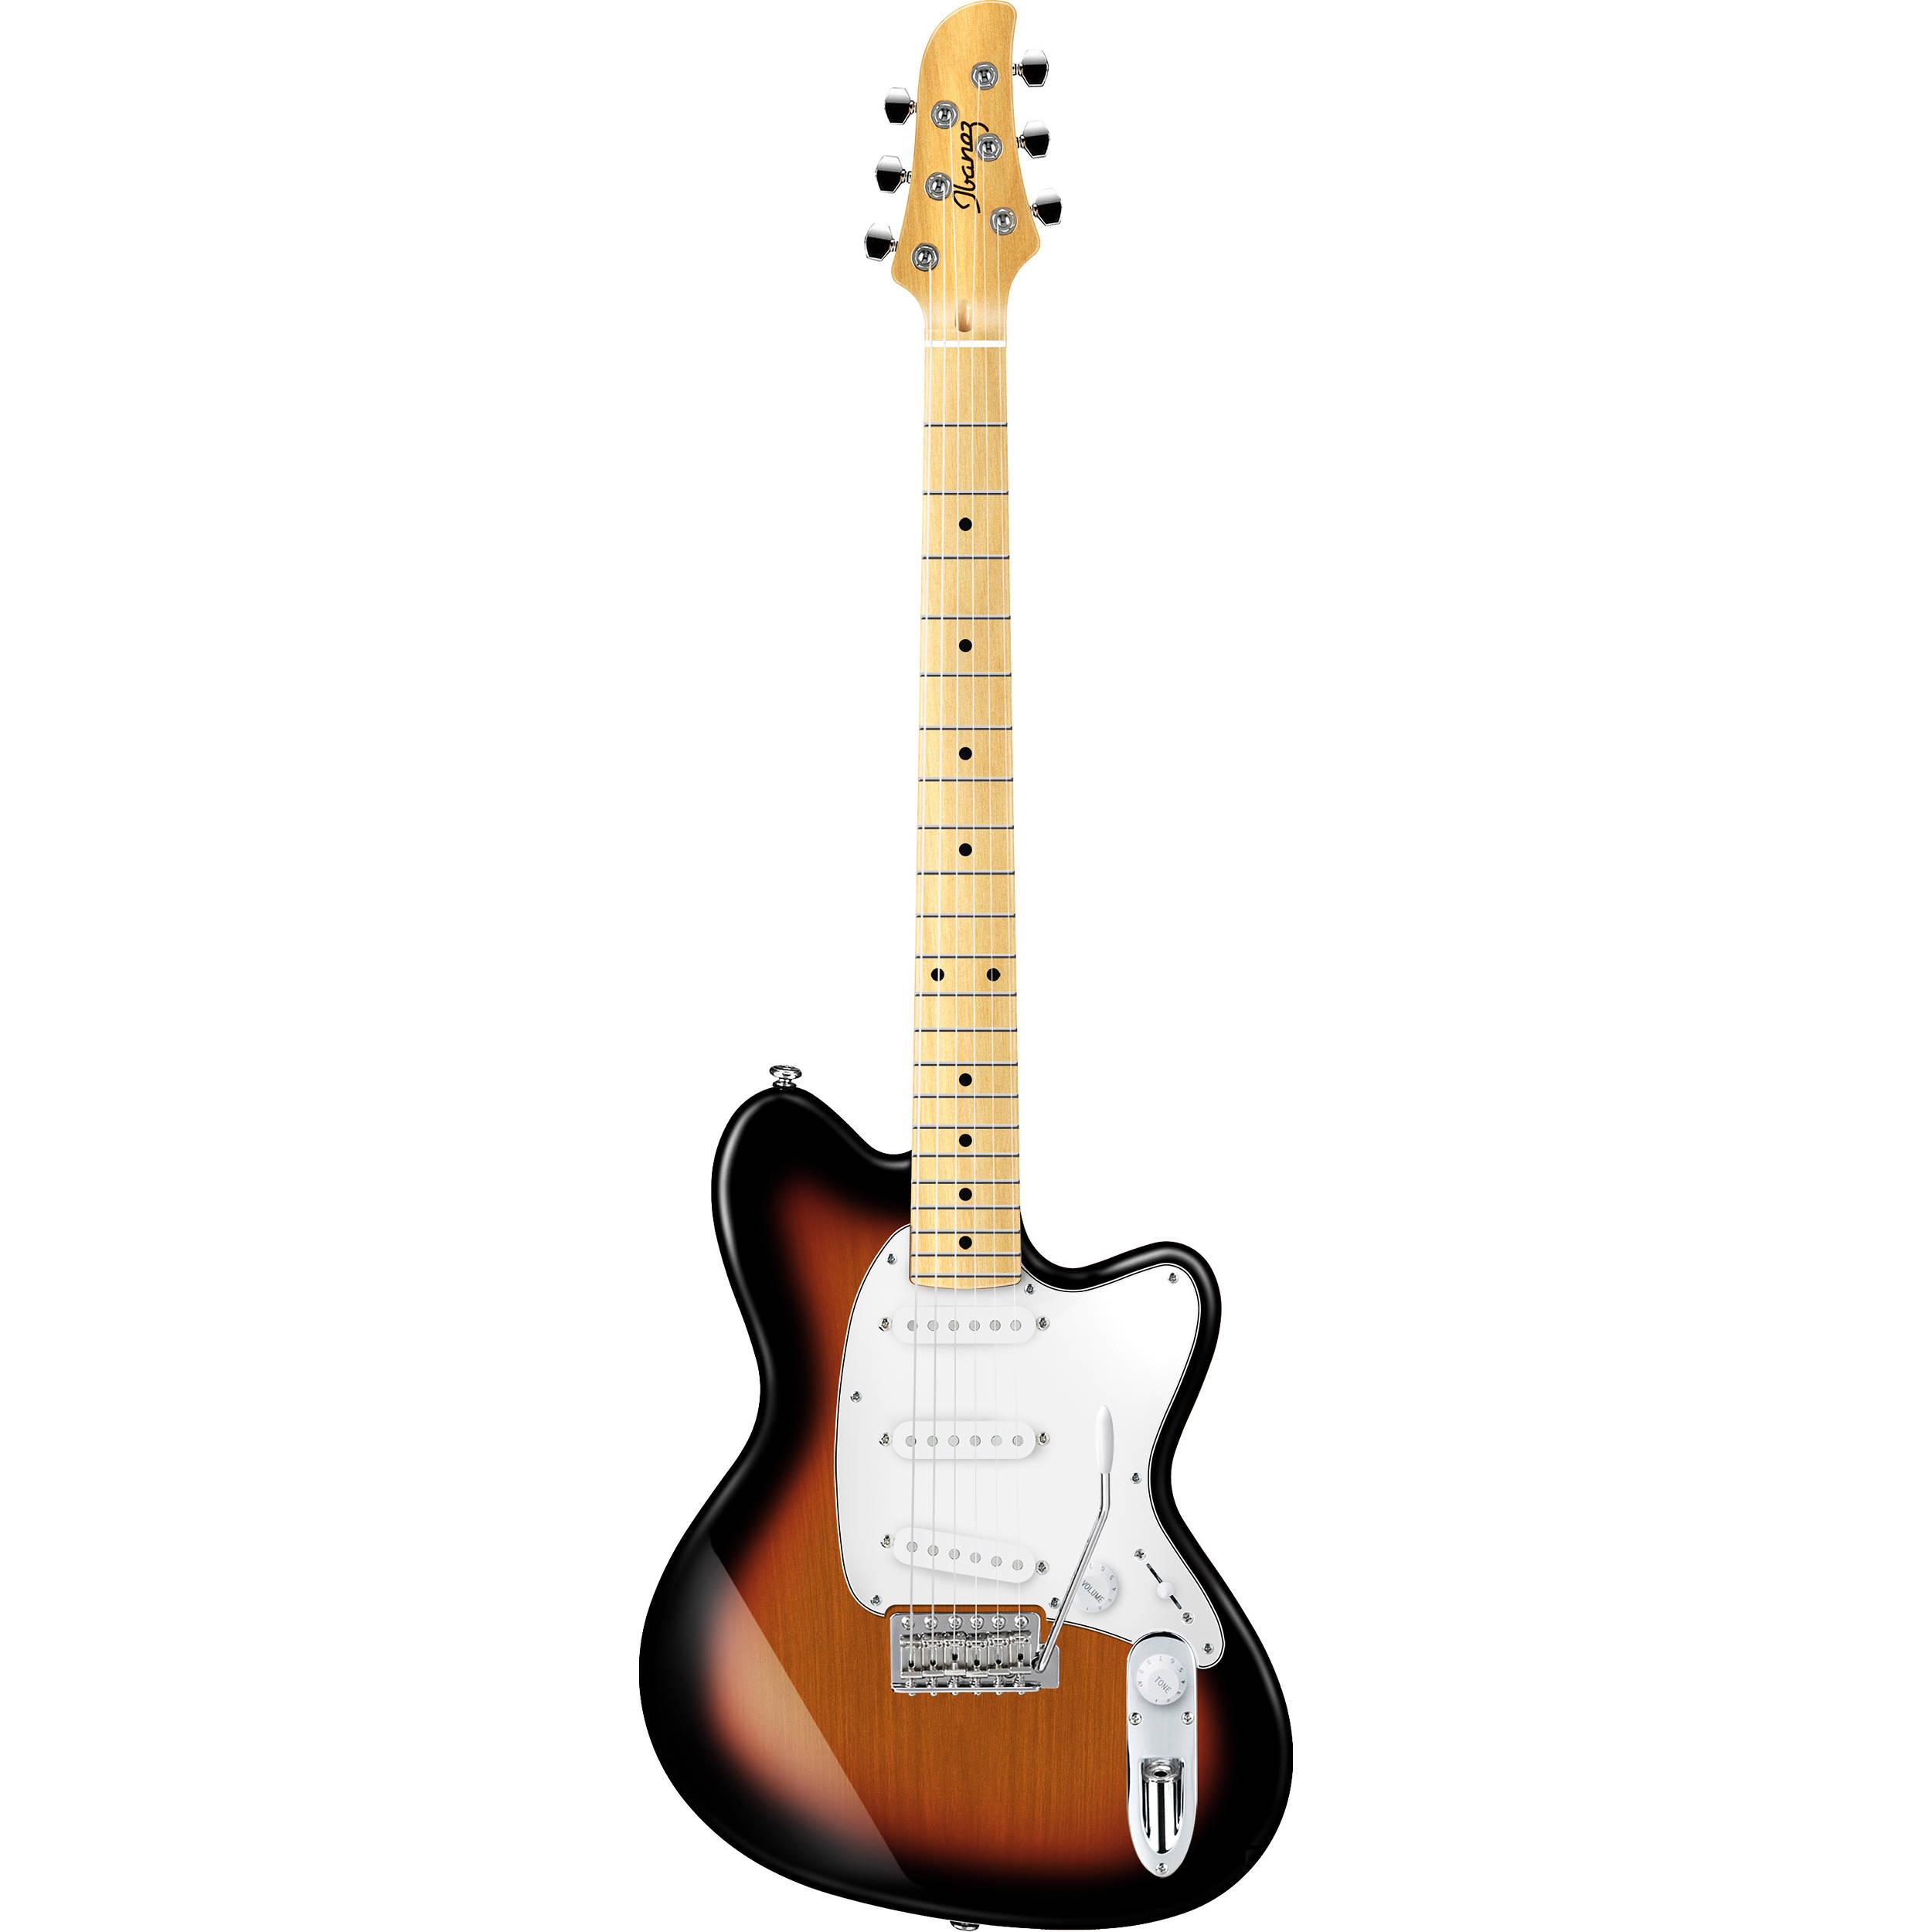 ibanez tm330m talman standard series electric guitar tm330mtfb. Black Bedroom Furniture Sets. Home Design Ideas